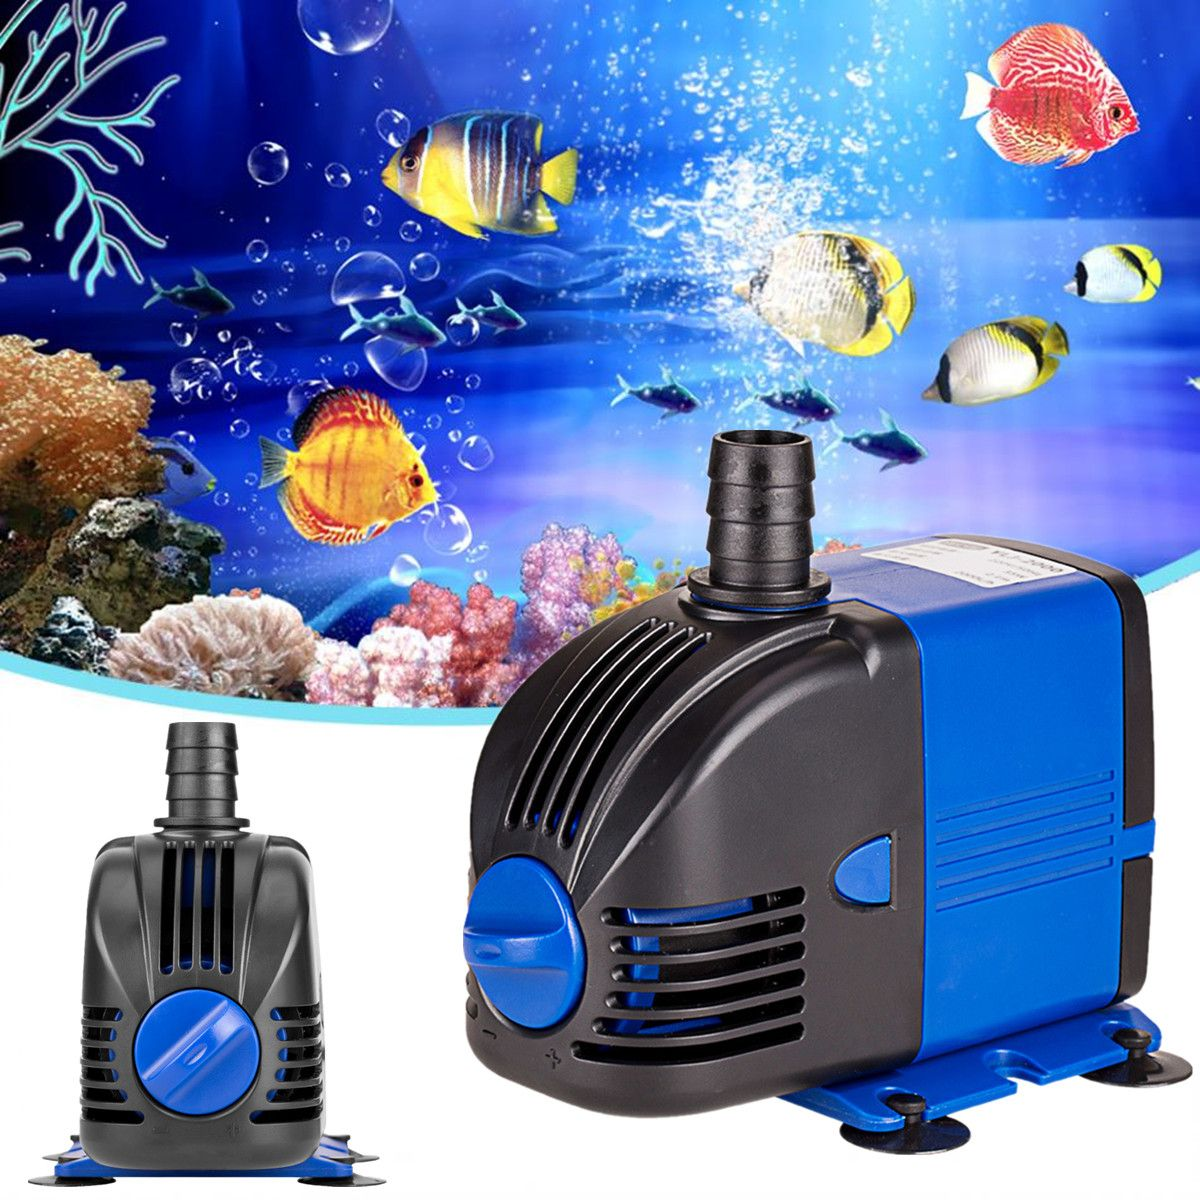 Water Pump Fish Tank AC220-240V 50Hz 3-60W Submersible Aquarium Powerhead Fountain Hydroponic US Plug Ponds Aquariums Adjust